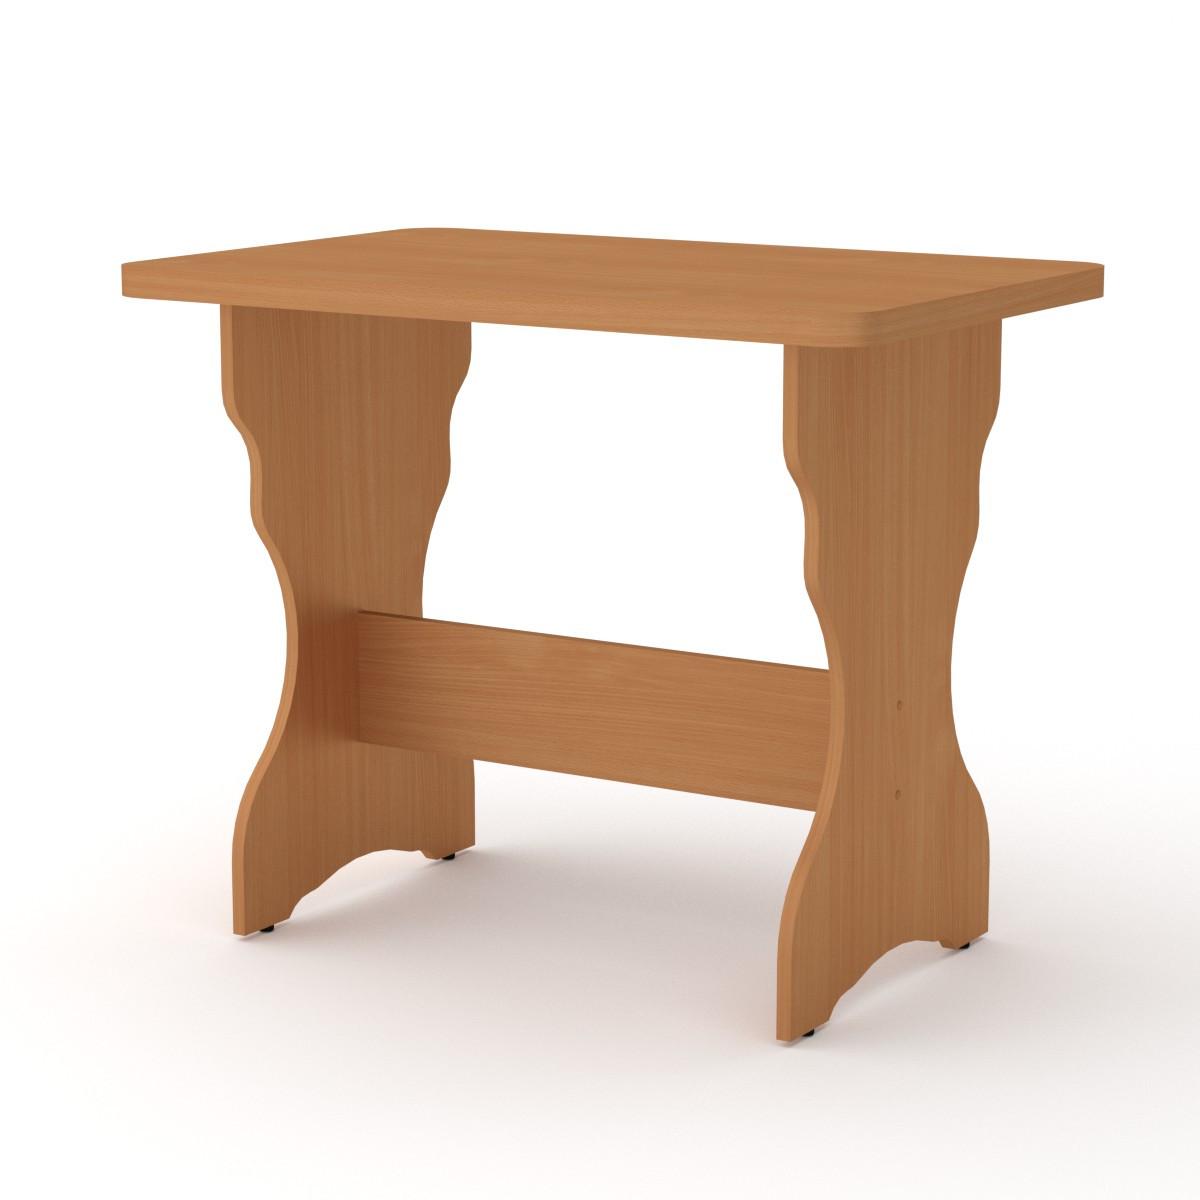 Стол кухонный КС-3 яблоня Компанит (90х59х73 см), фото 5